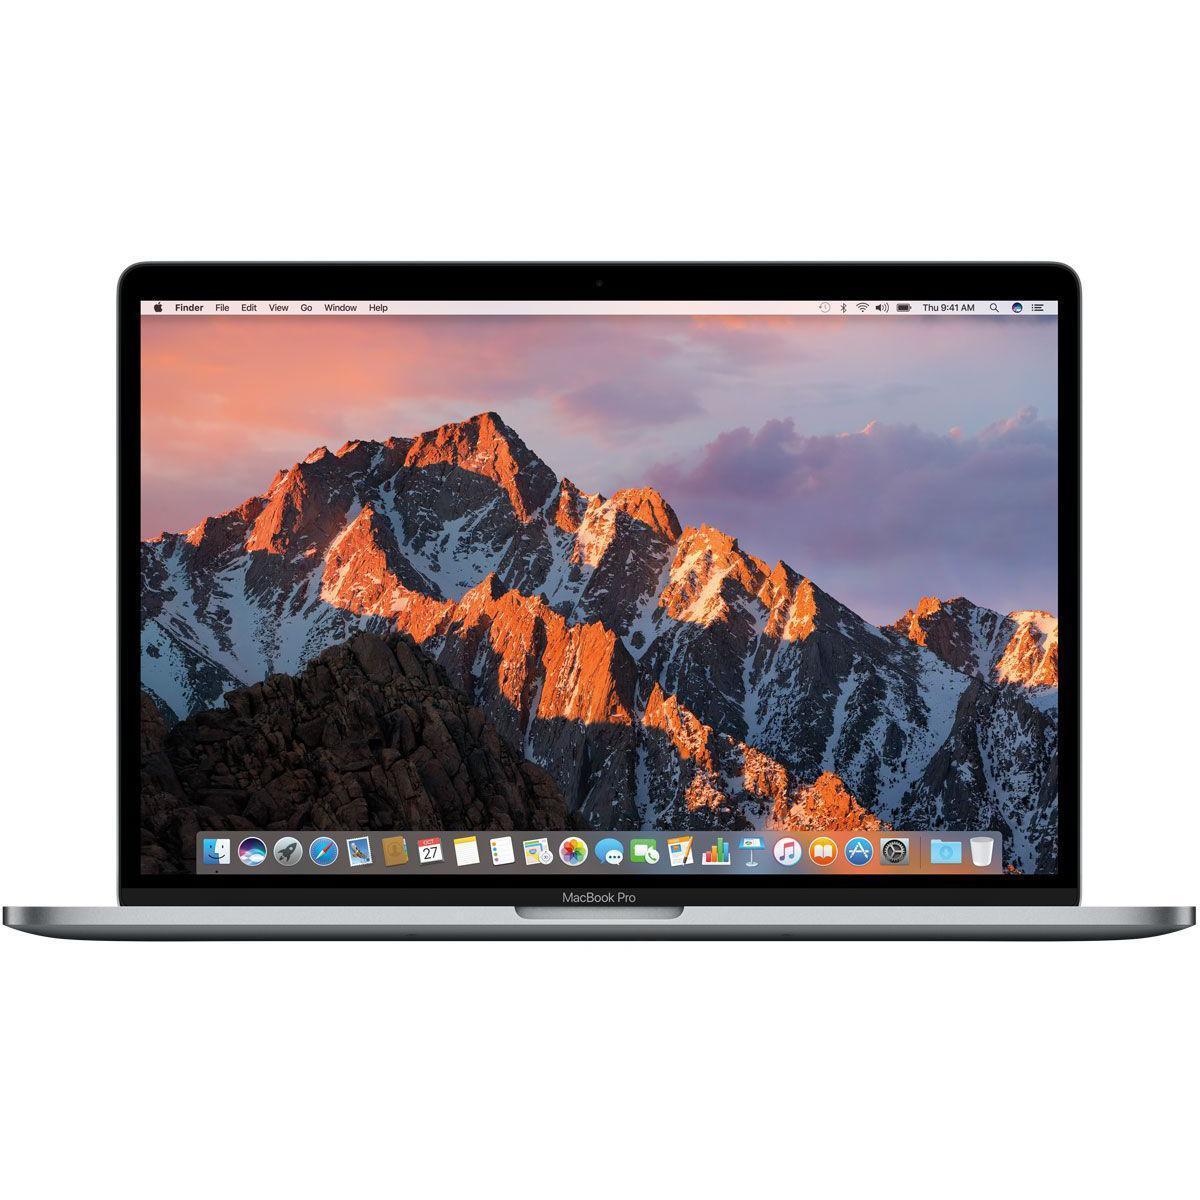 MacBook Pro Retina 15.4-inch (2018) - Core i7 - 16GB - SSD 512 GB